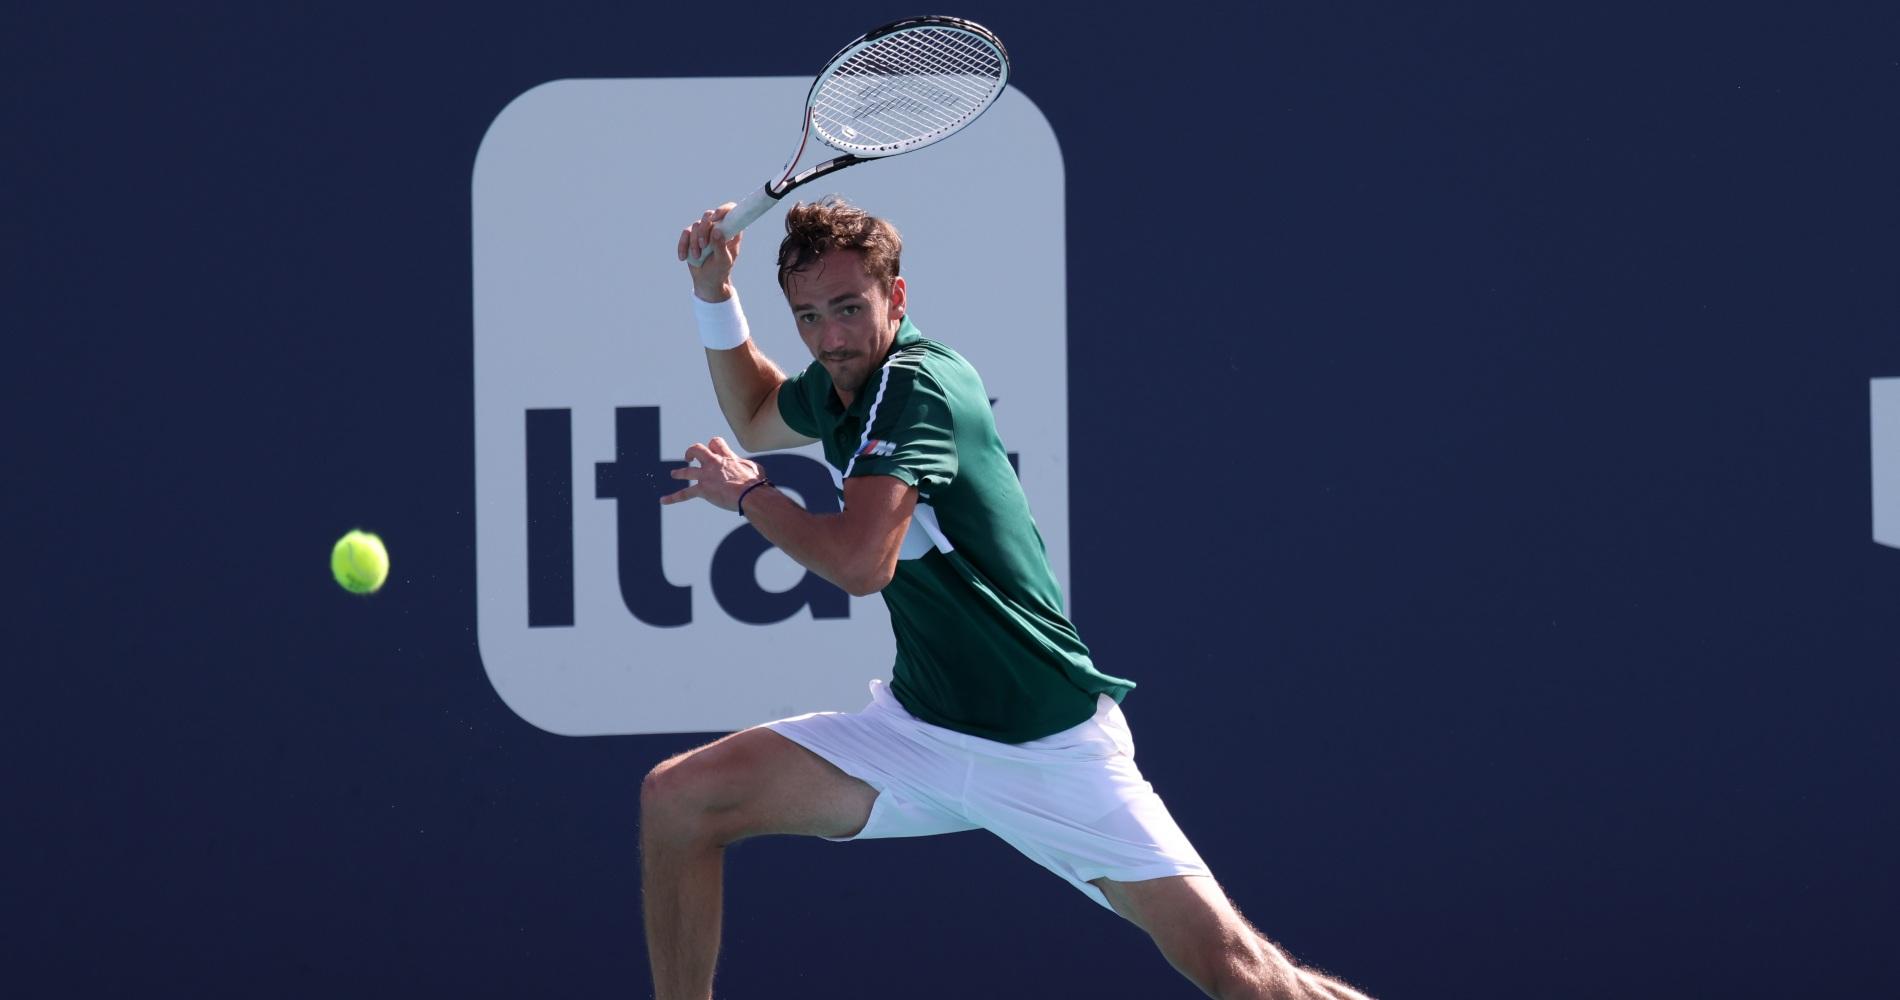 Medvedev Miami Open 2021